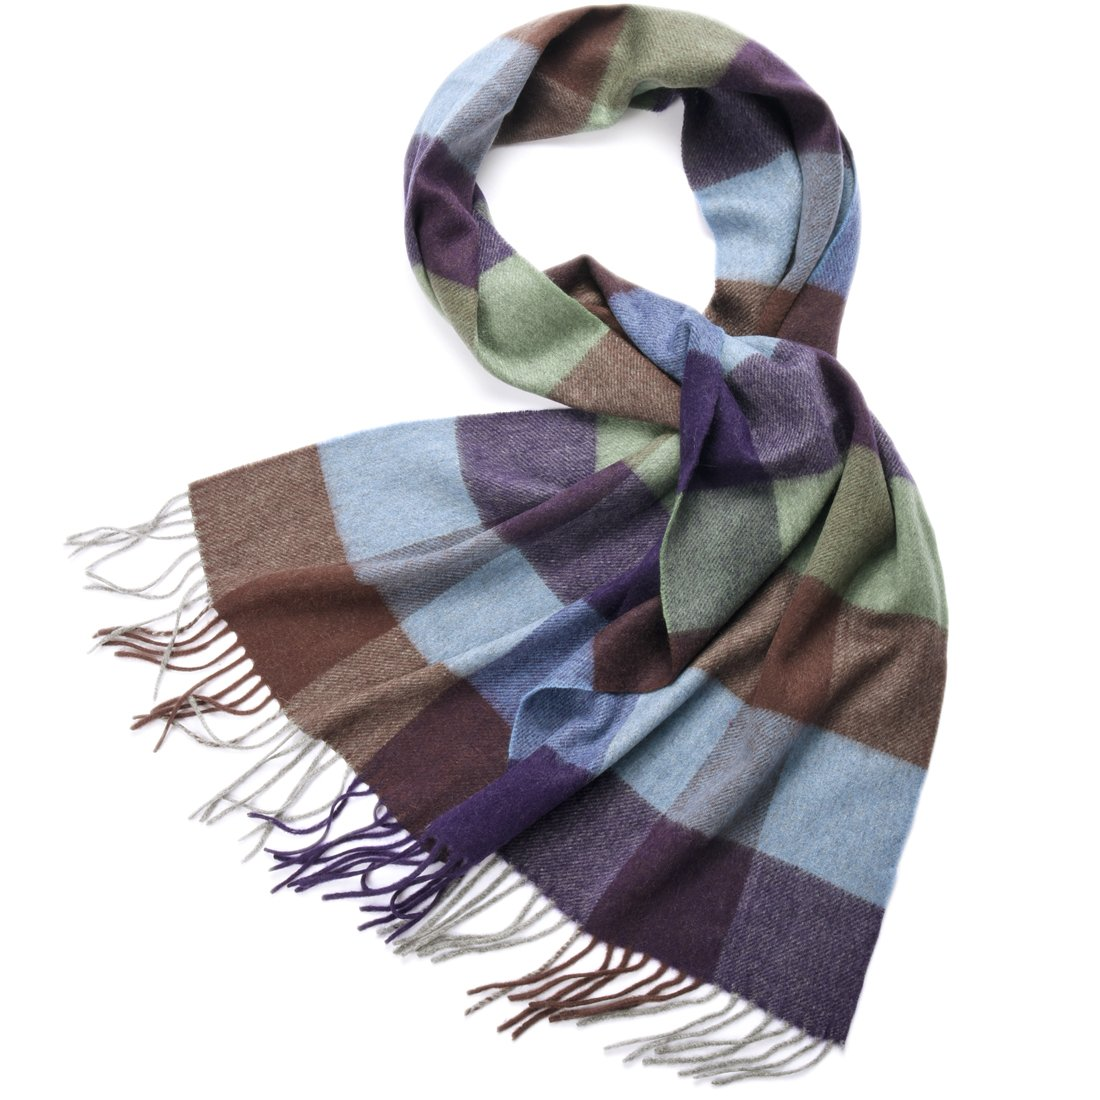 Cashmere Winter Scarf Women Mens-ZORJAR Pure Cashmere Plaid Shawl Long Wrap For Shawls and Wraps,Warm,Soft 65''x11.8''(7#)